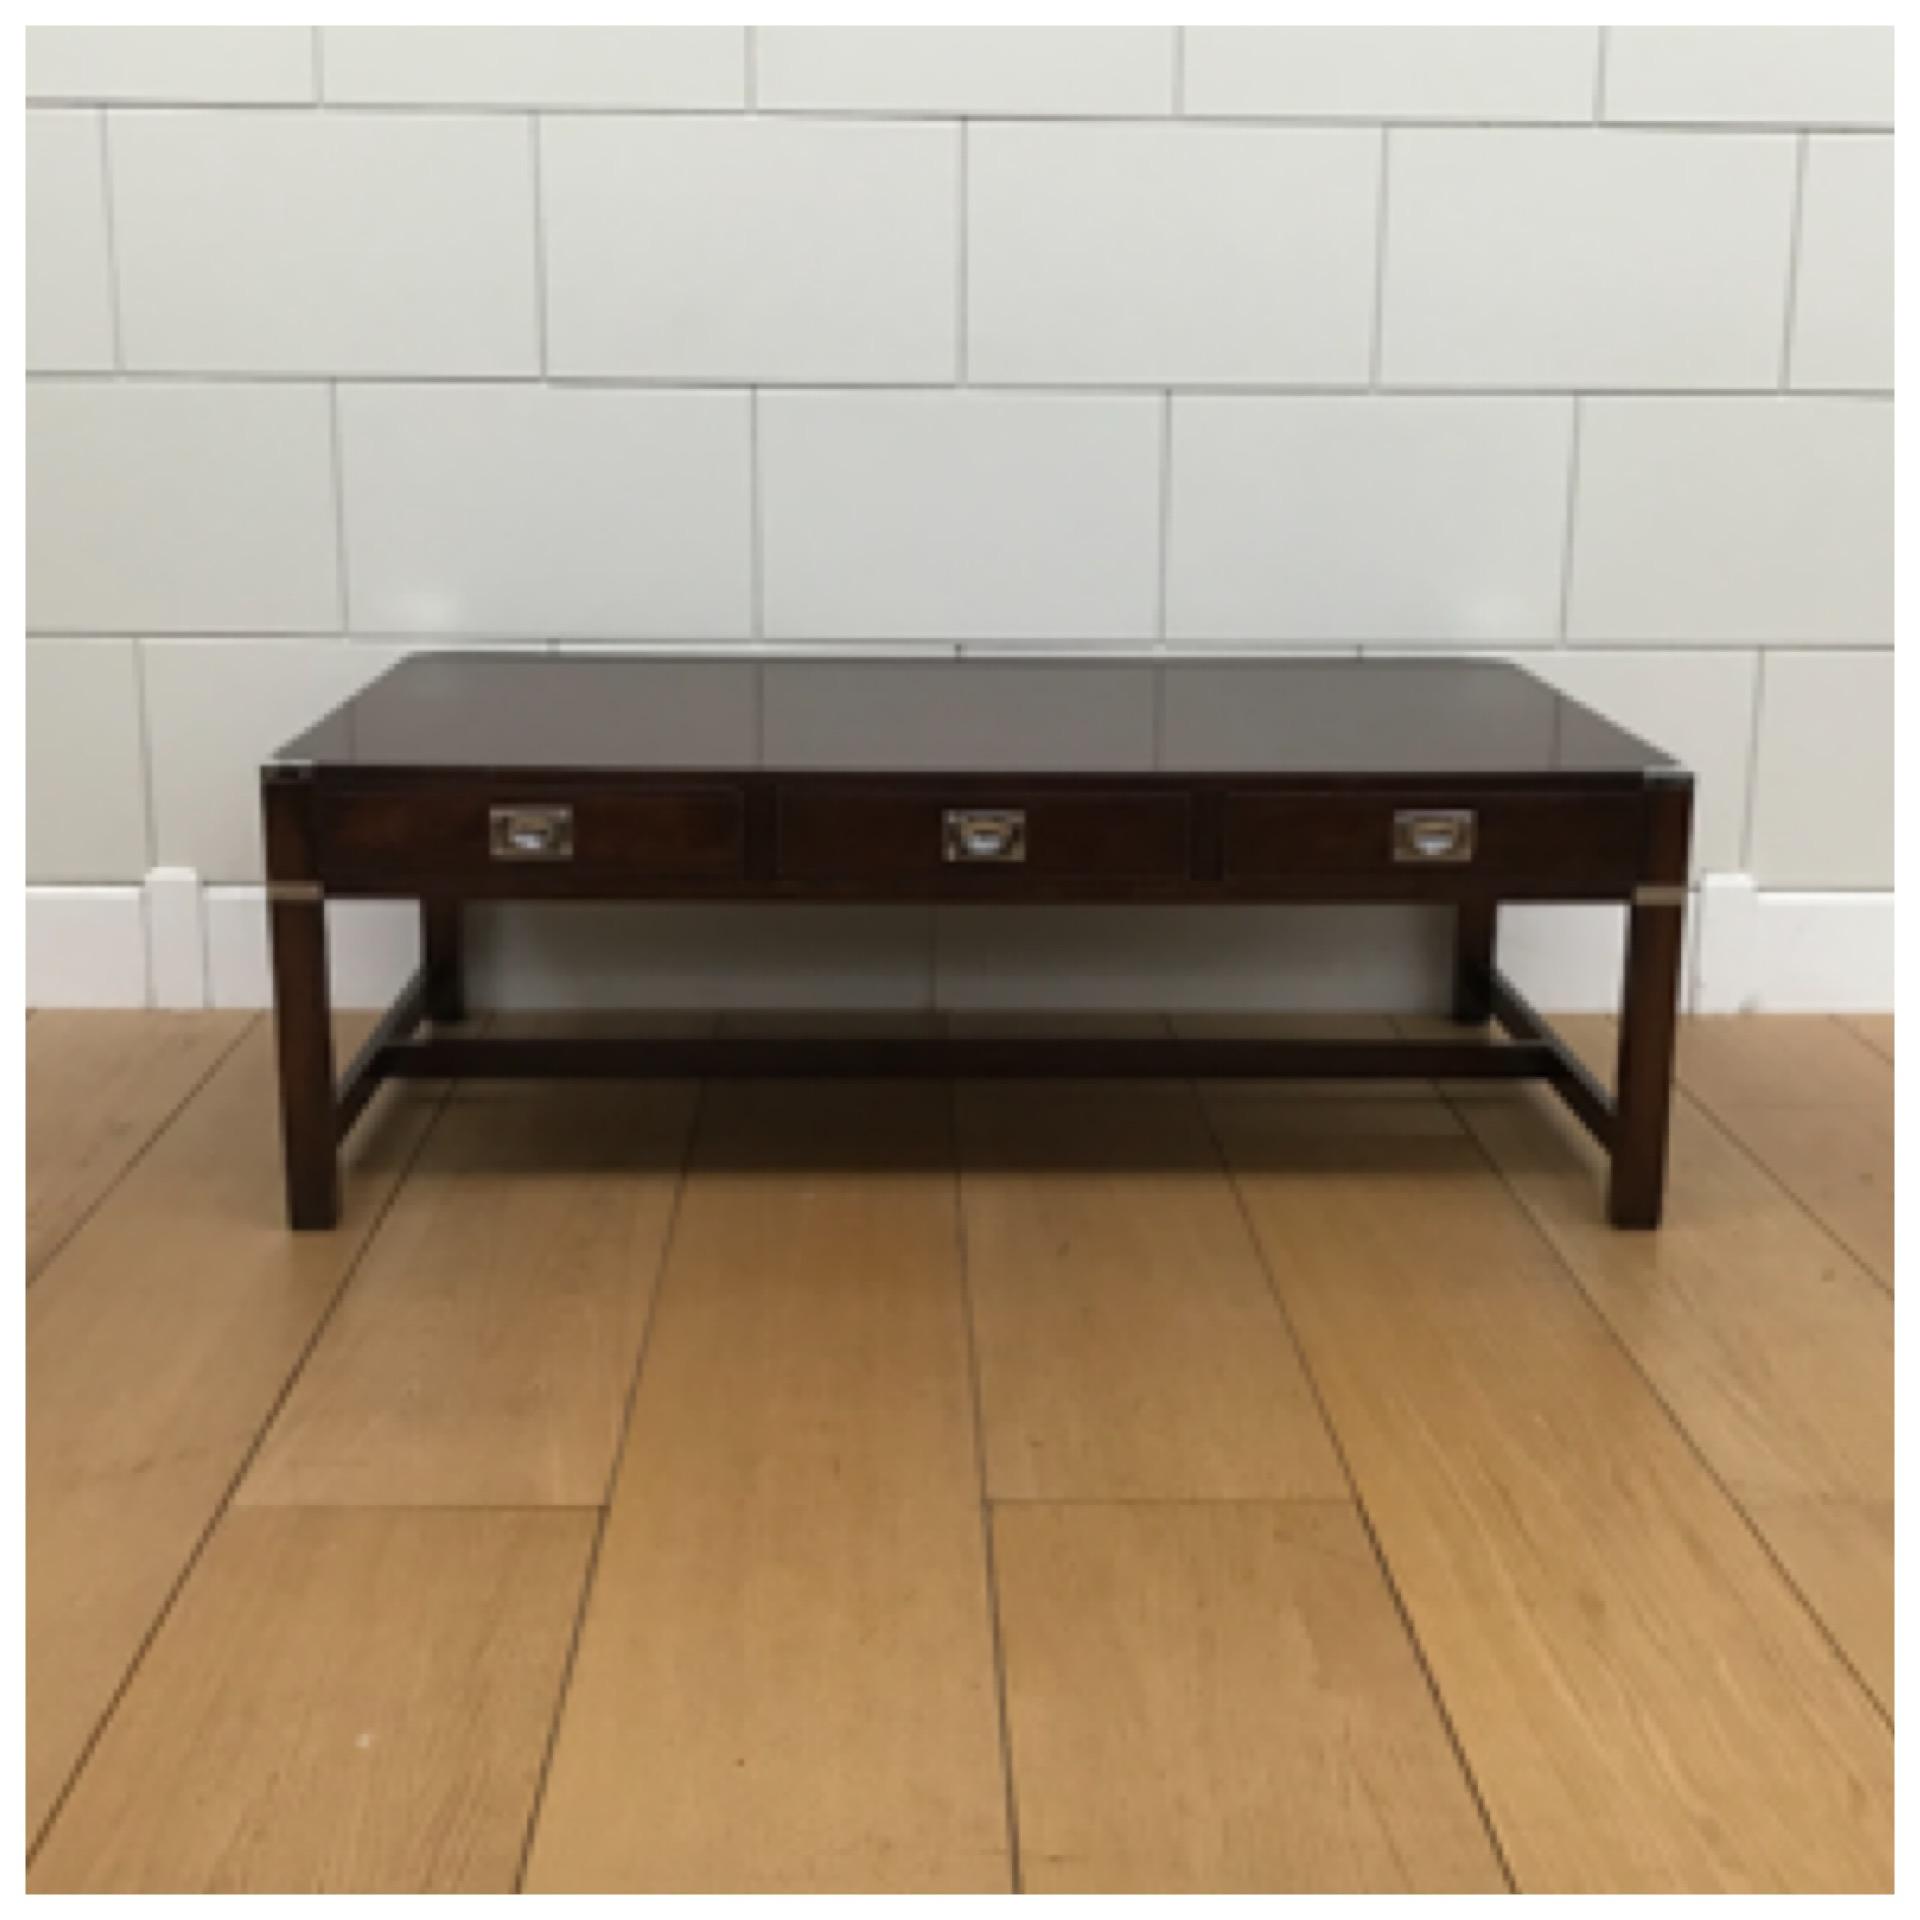 Sale Price: £700